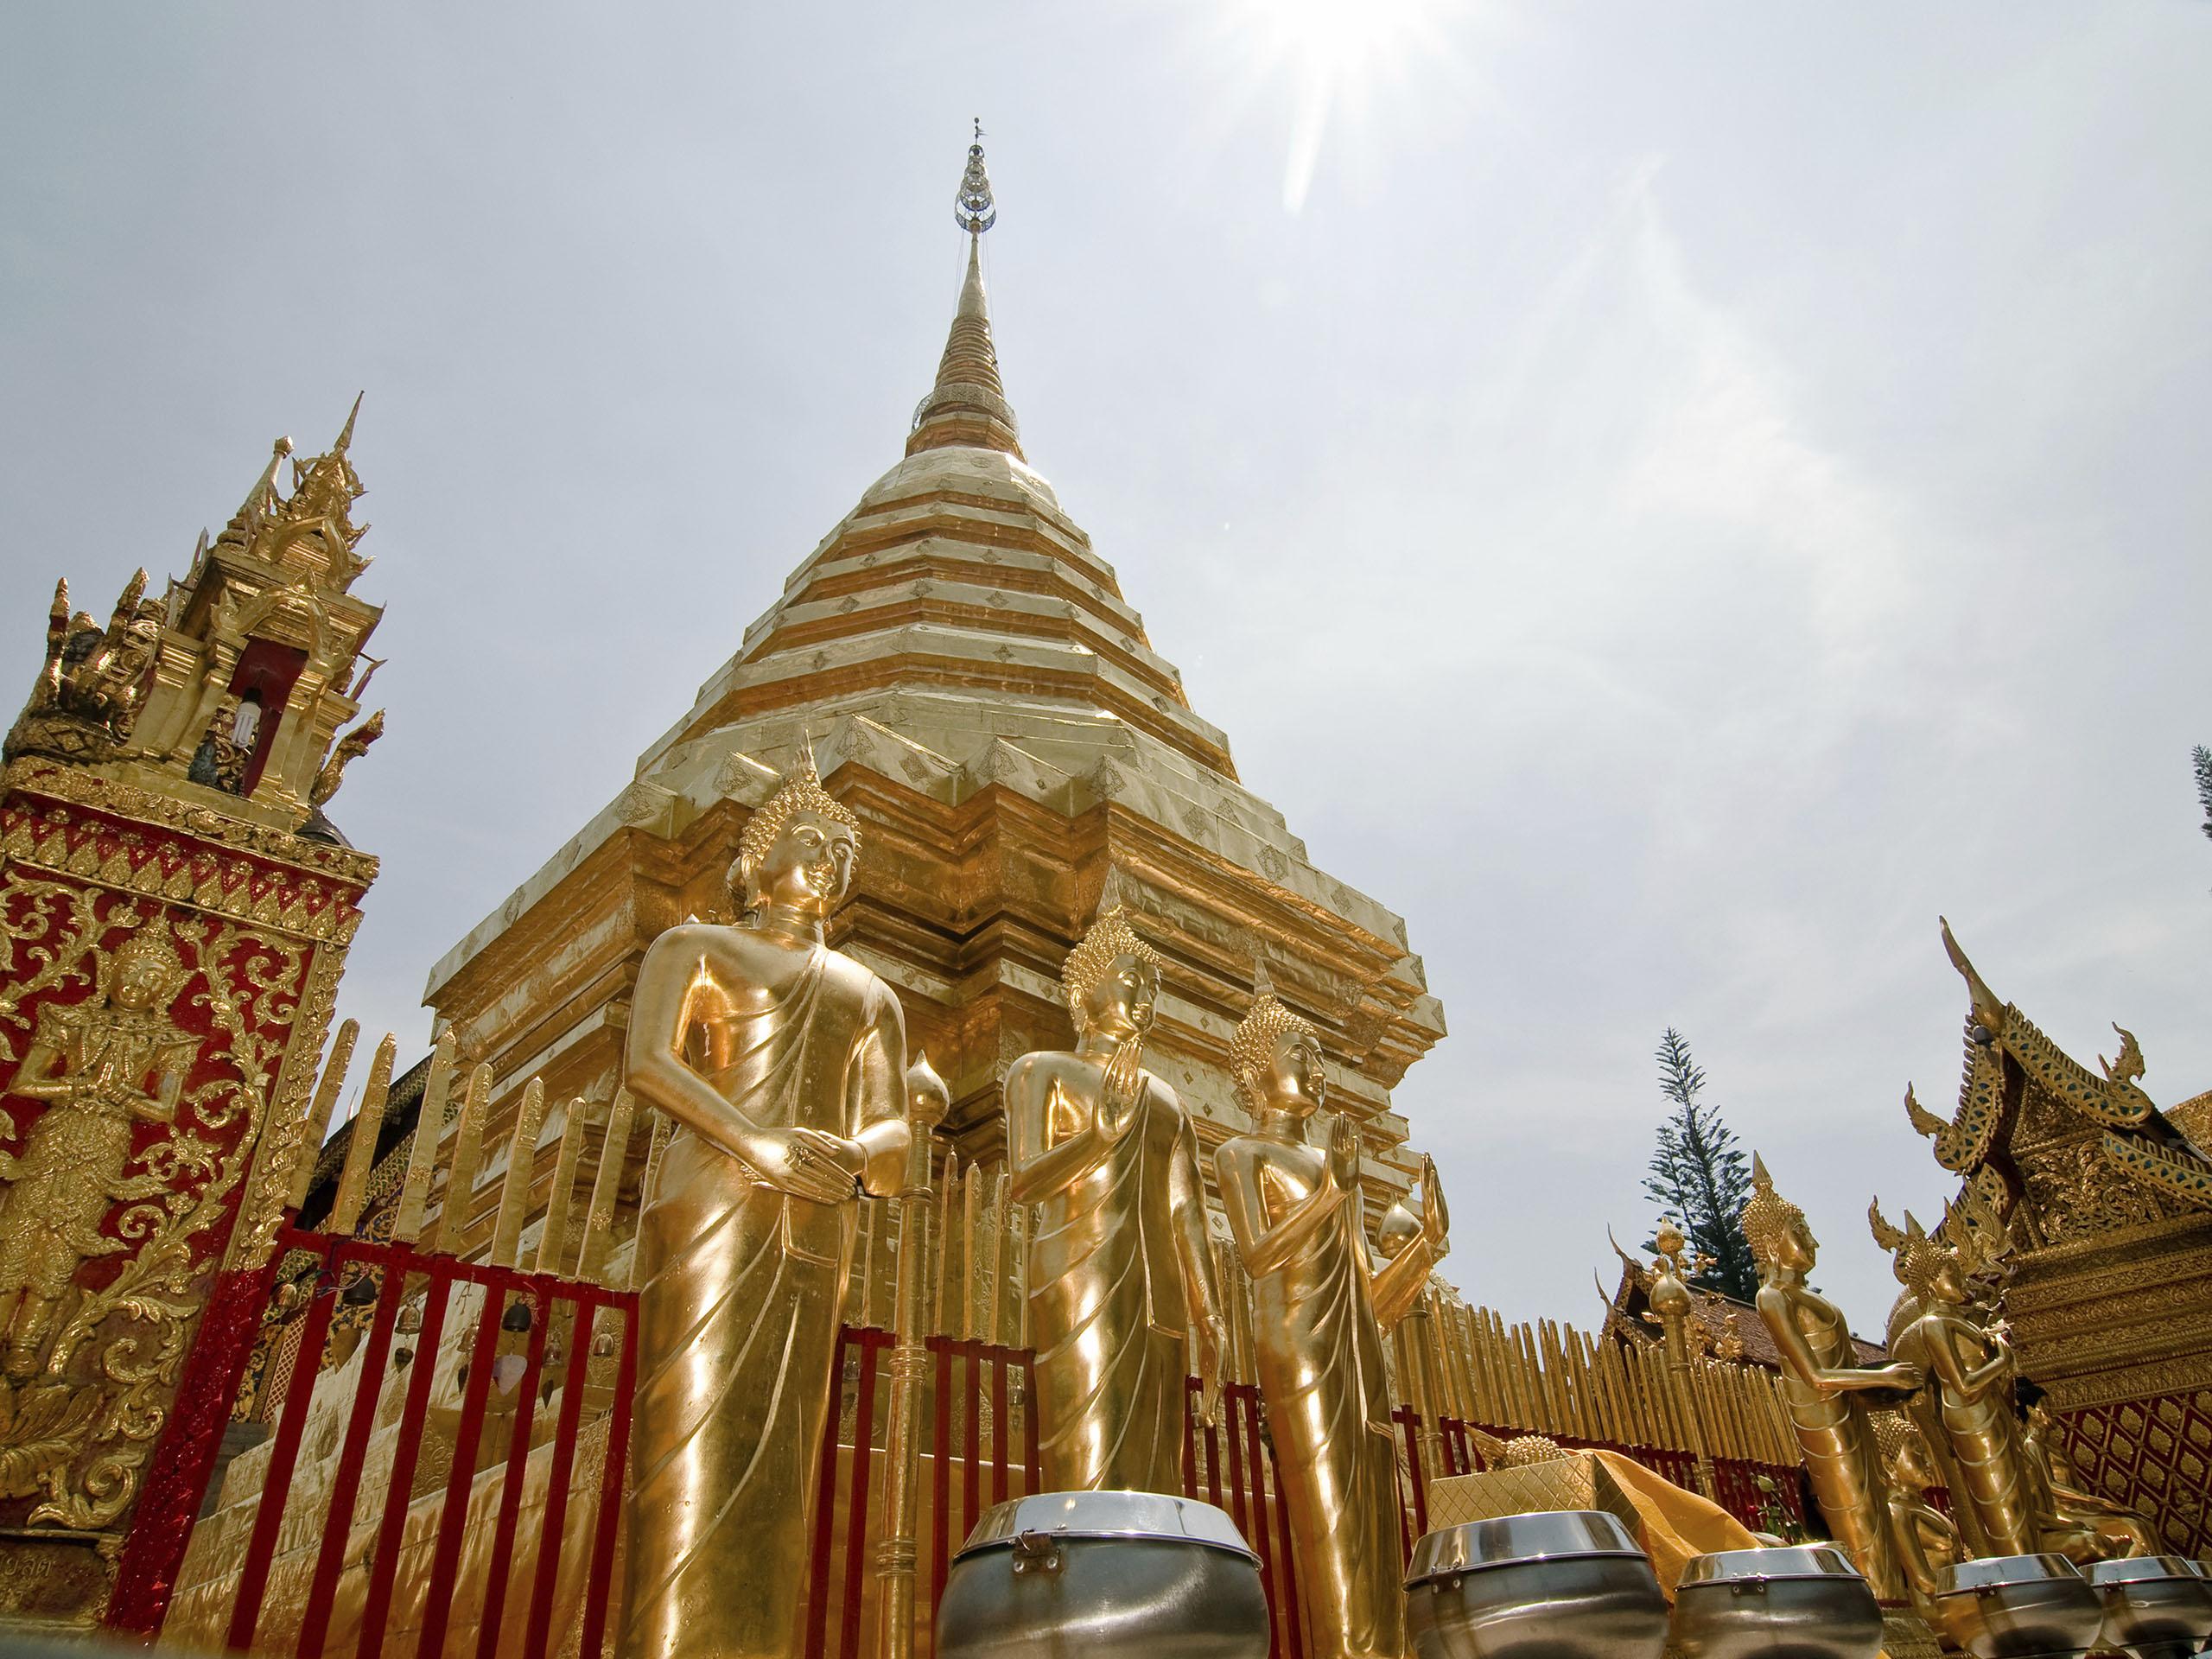 Enchanting Chiang Mai, Wat Phrathat Doi Suthep